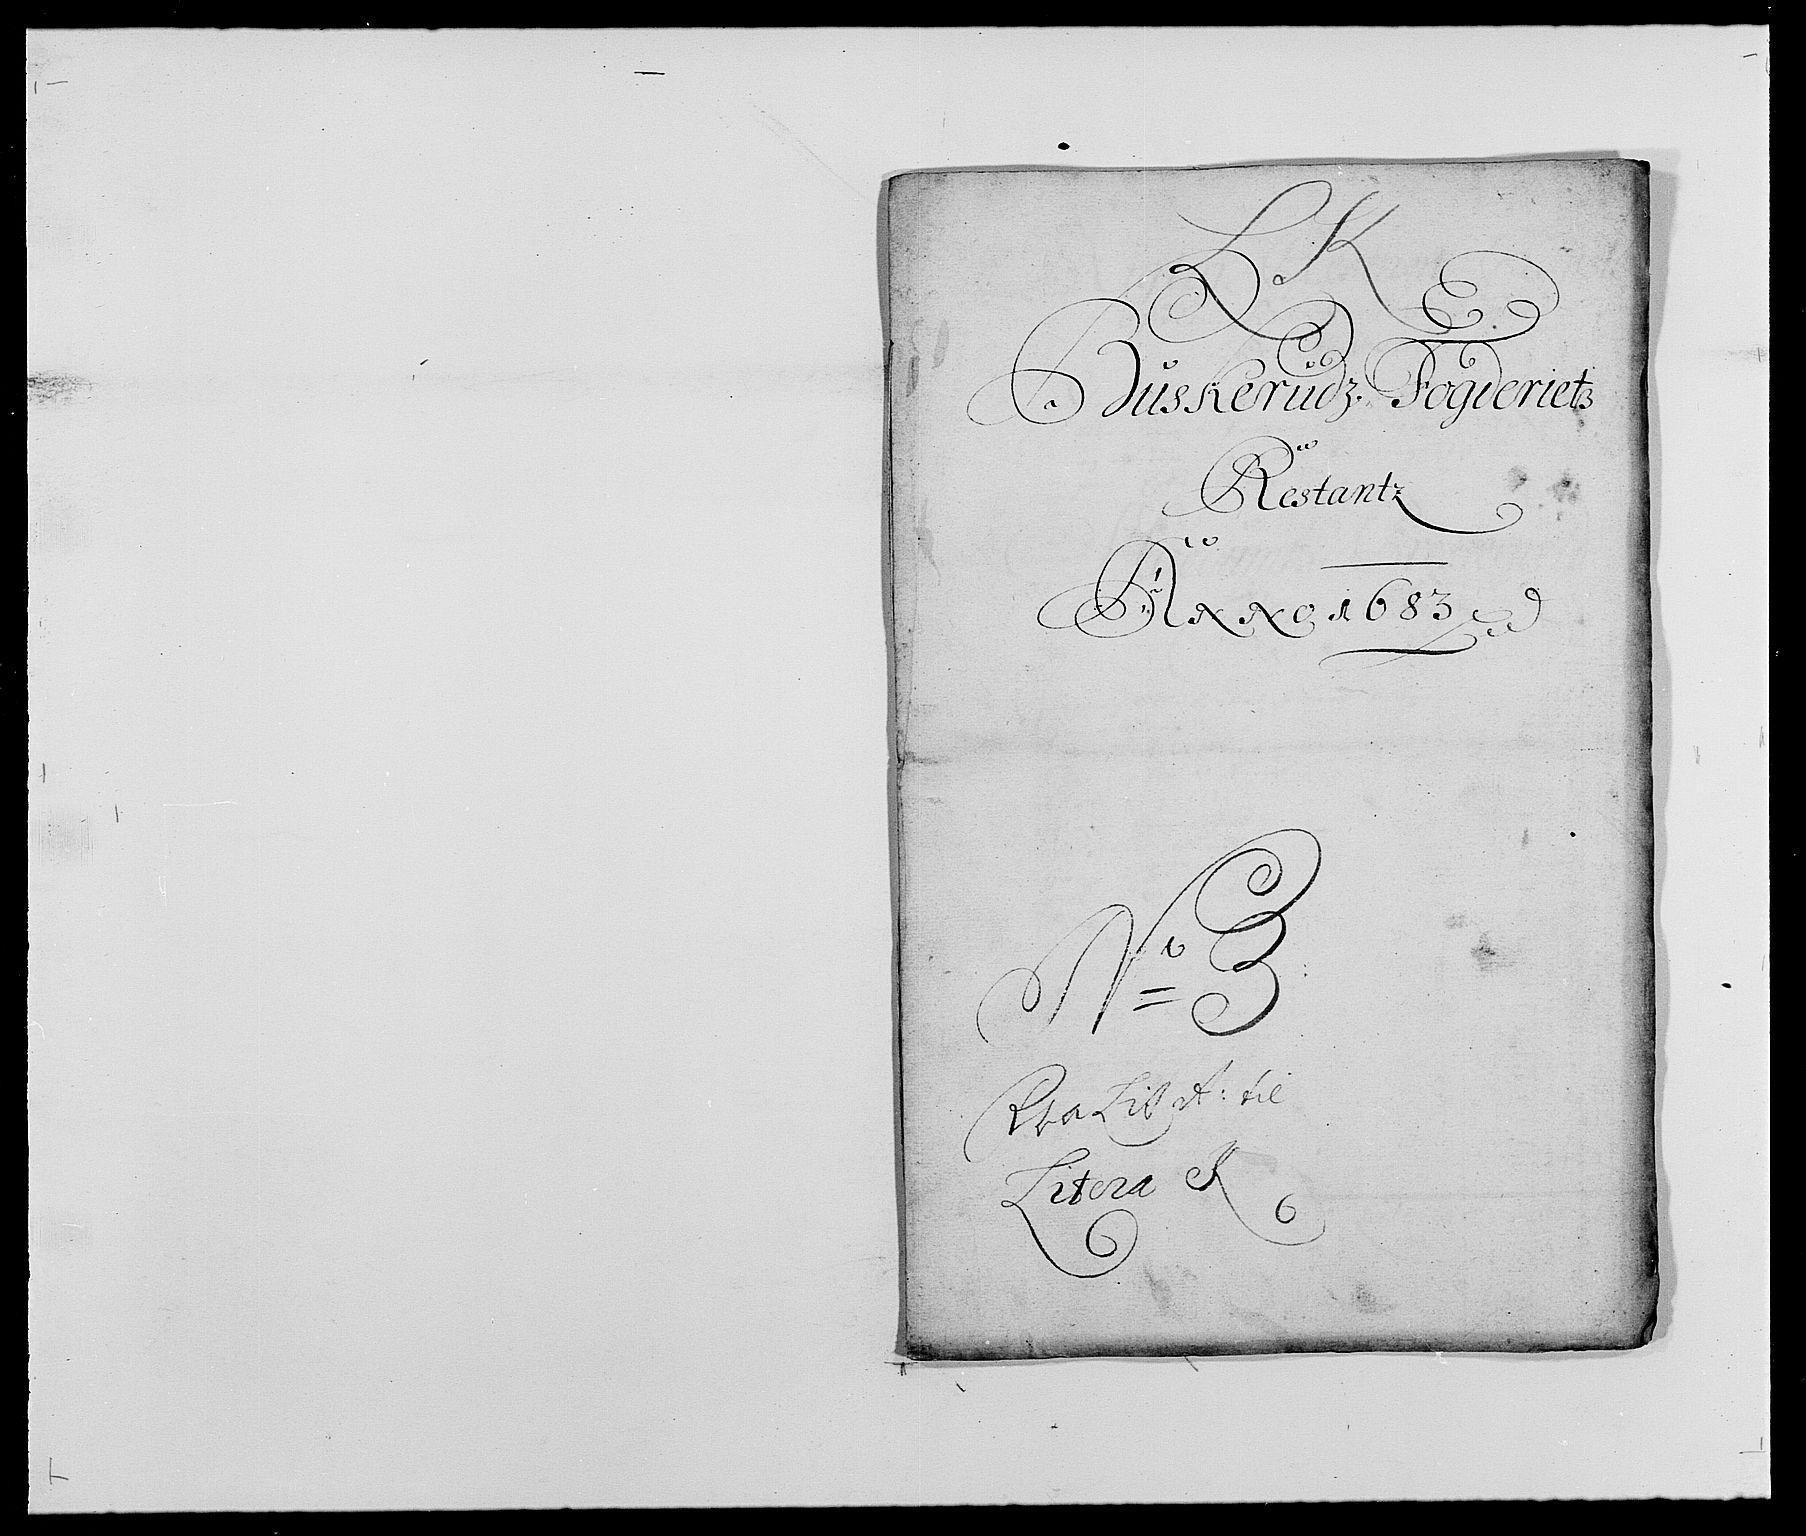 RA, Rentekammeret inntil 1814, Reviderte regnskaper, Fogderegnskap, R25/L1677: Fogderegnskap Buskerud, 1683-1684, s. 173